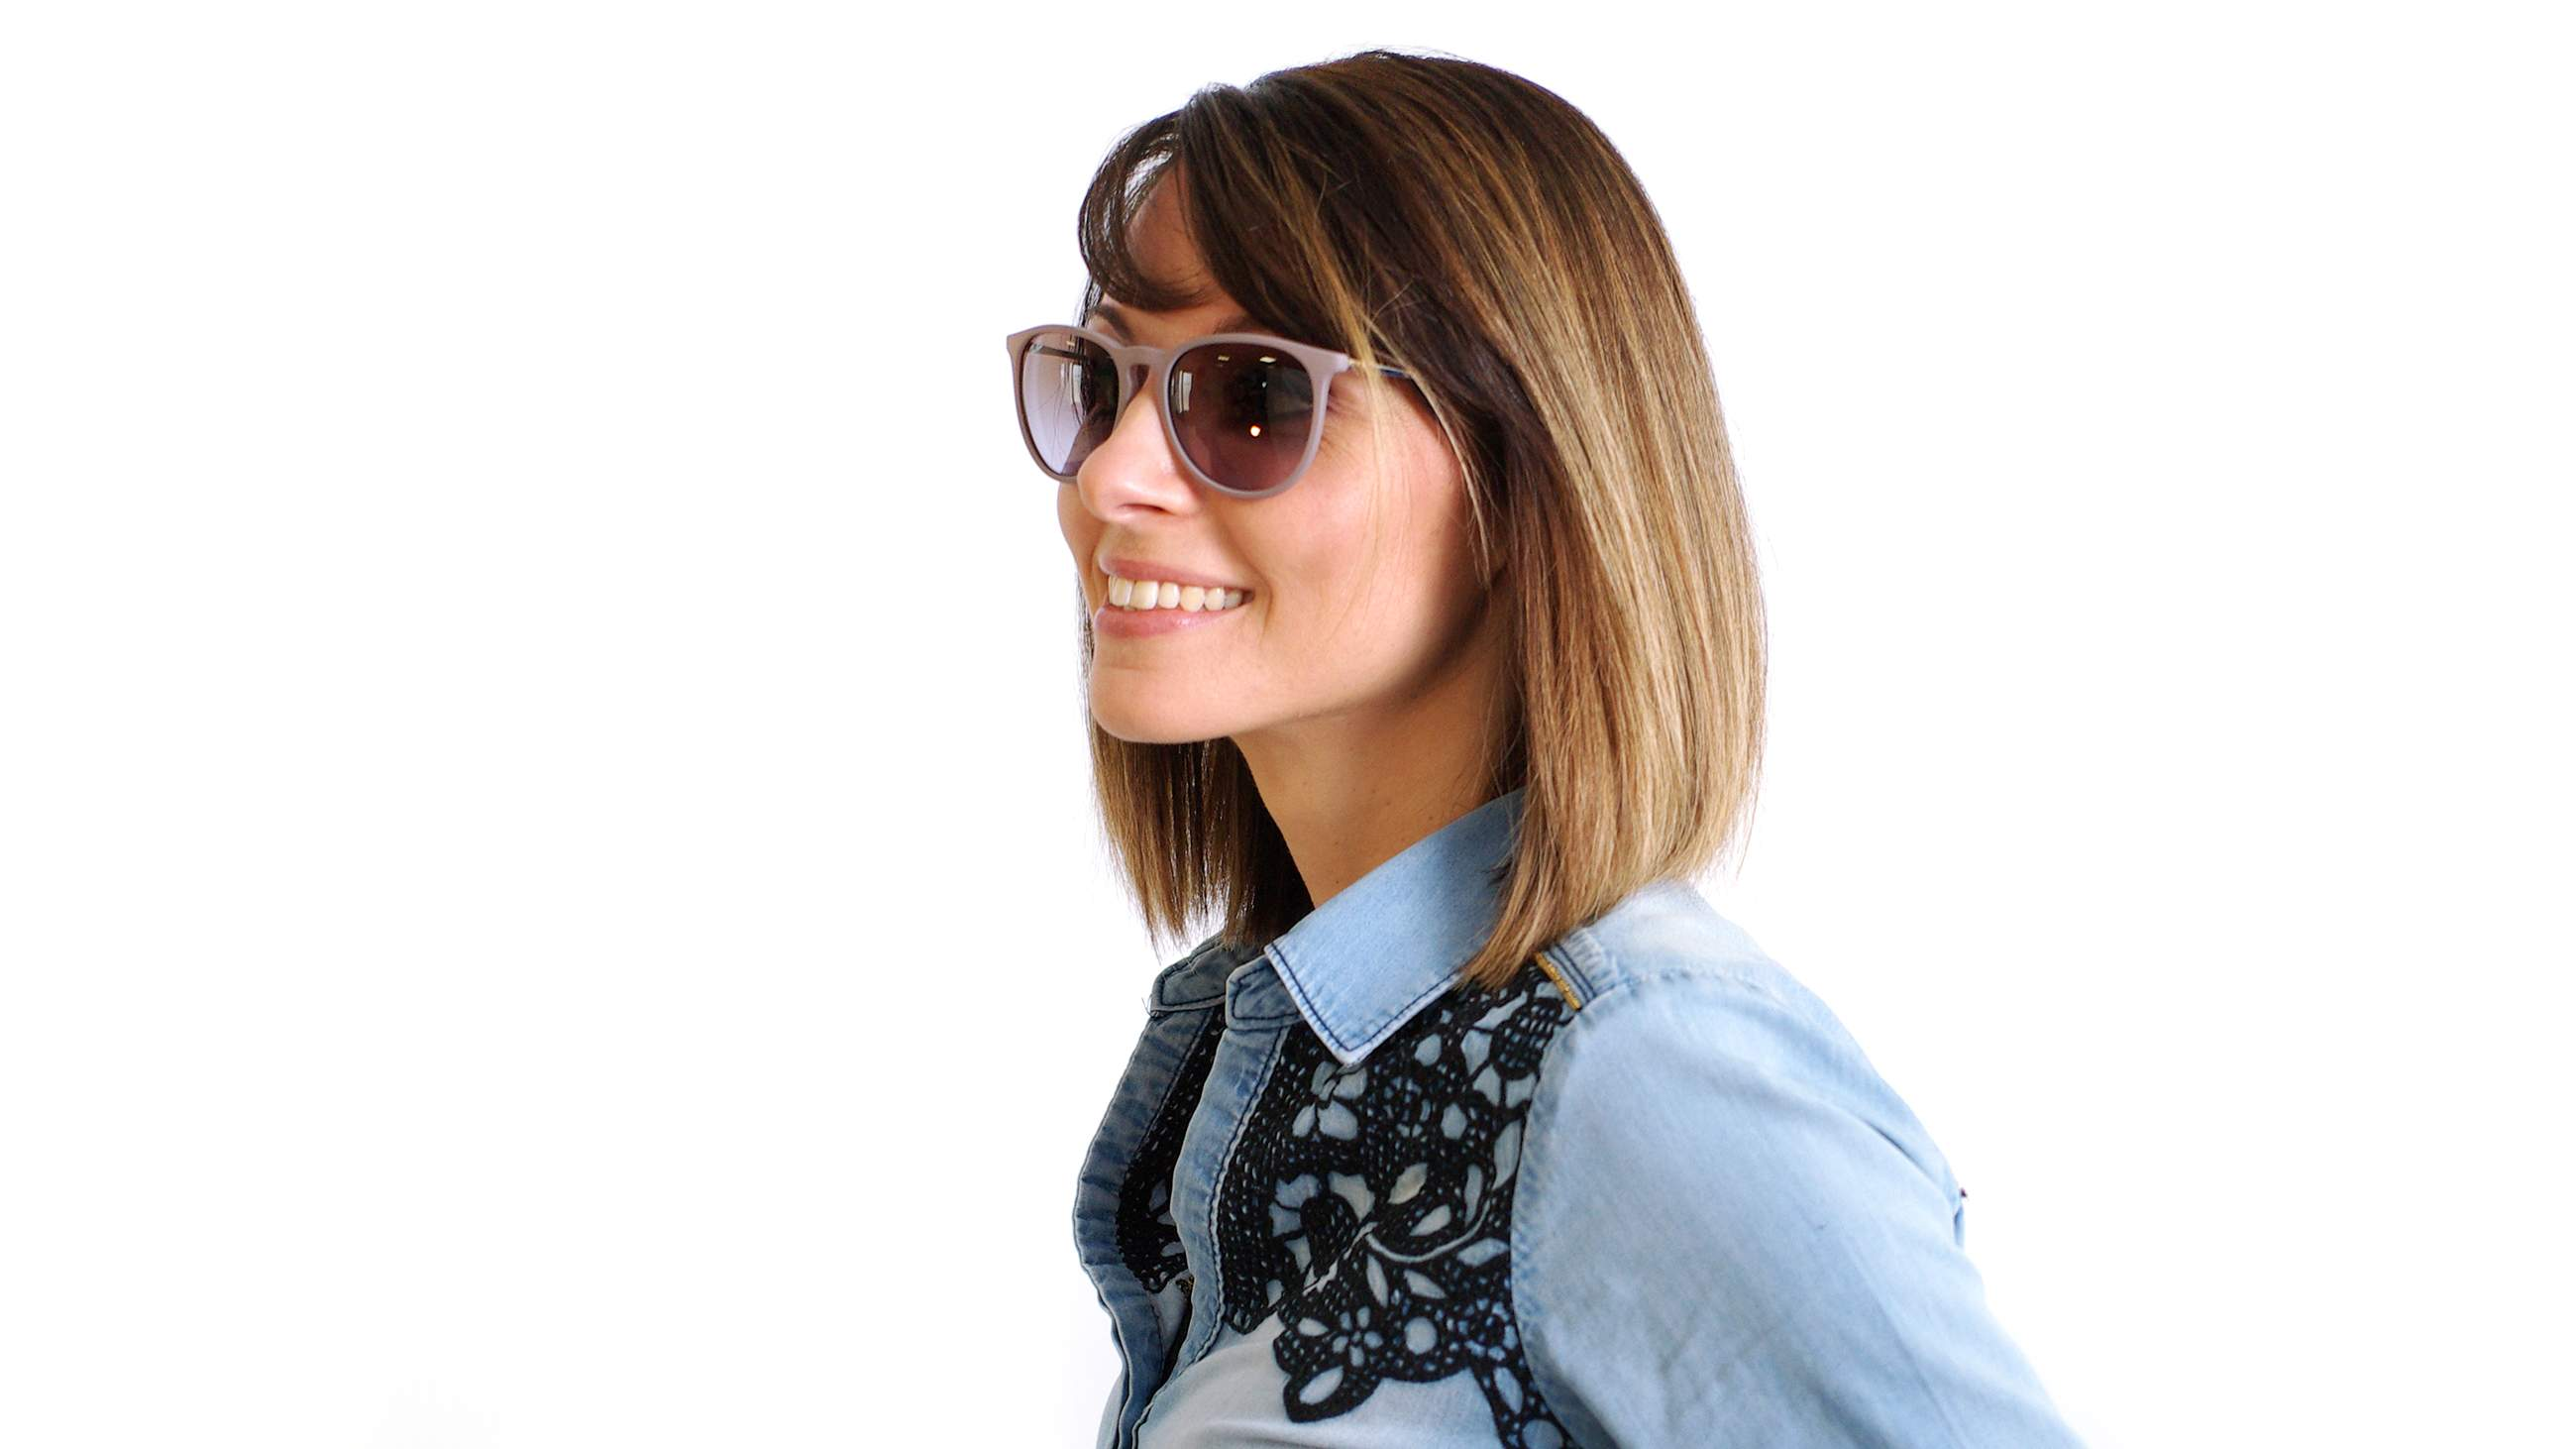 1e04726bfcb Sunglasses Ray-Ban Erika Brown RB4171 6000/68 54-20 Medium Gradient